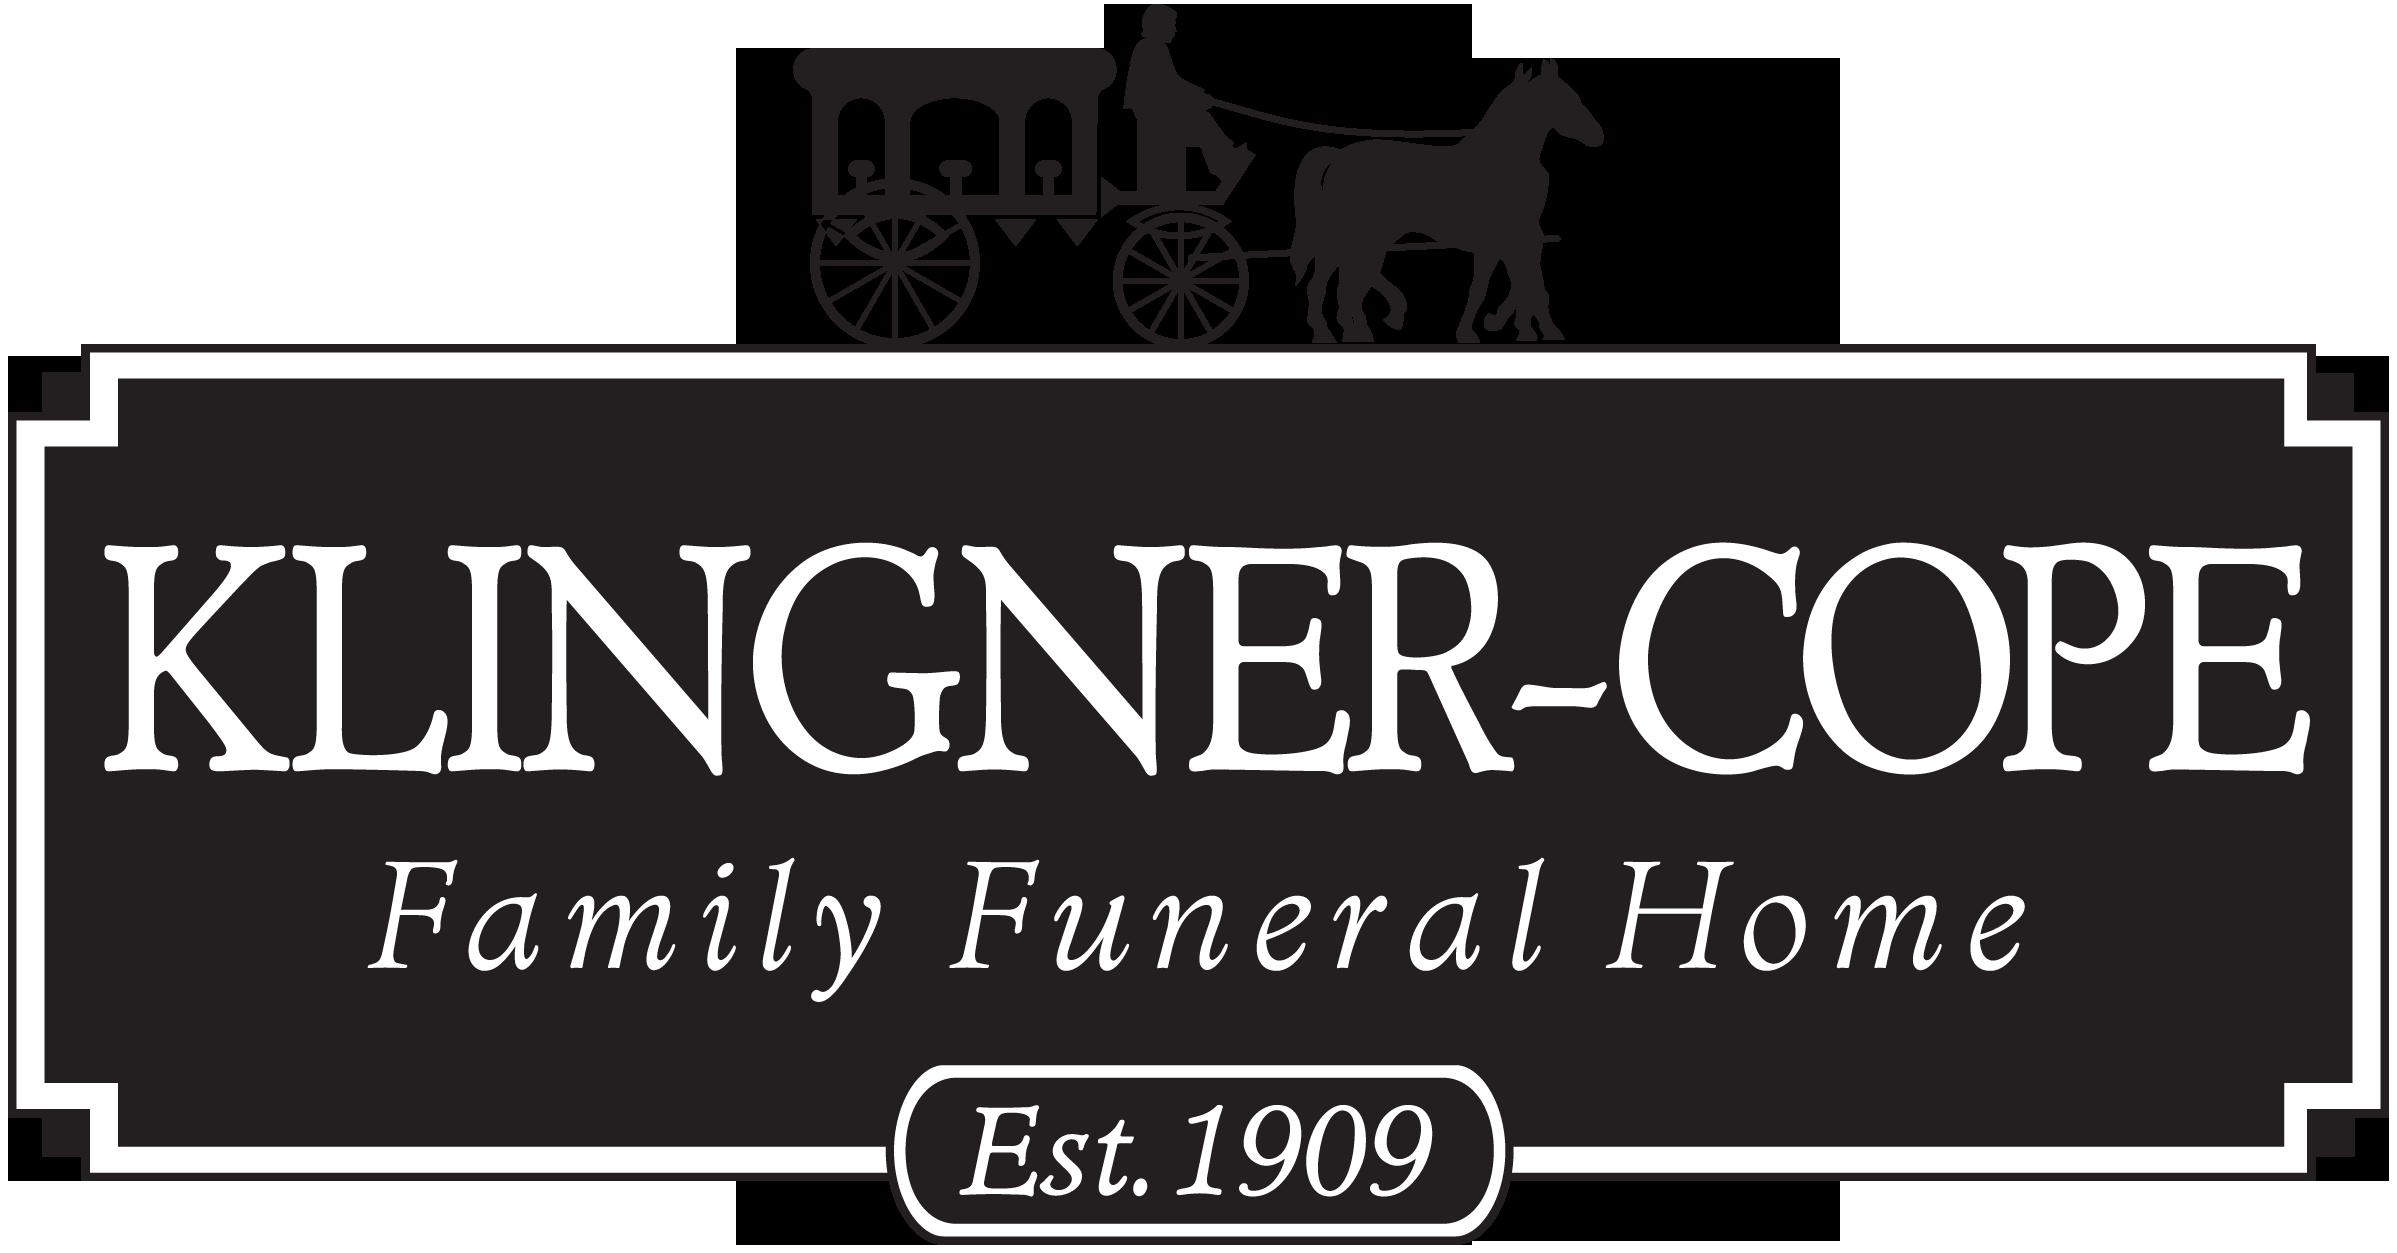 Klingner-Cope at White Chapel